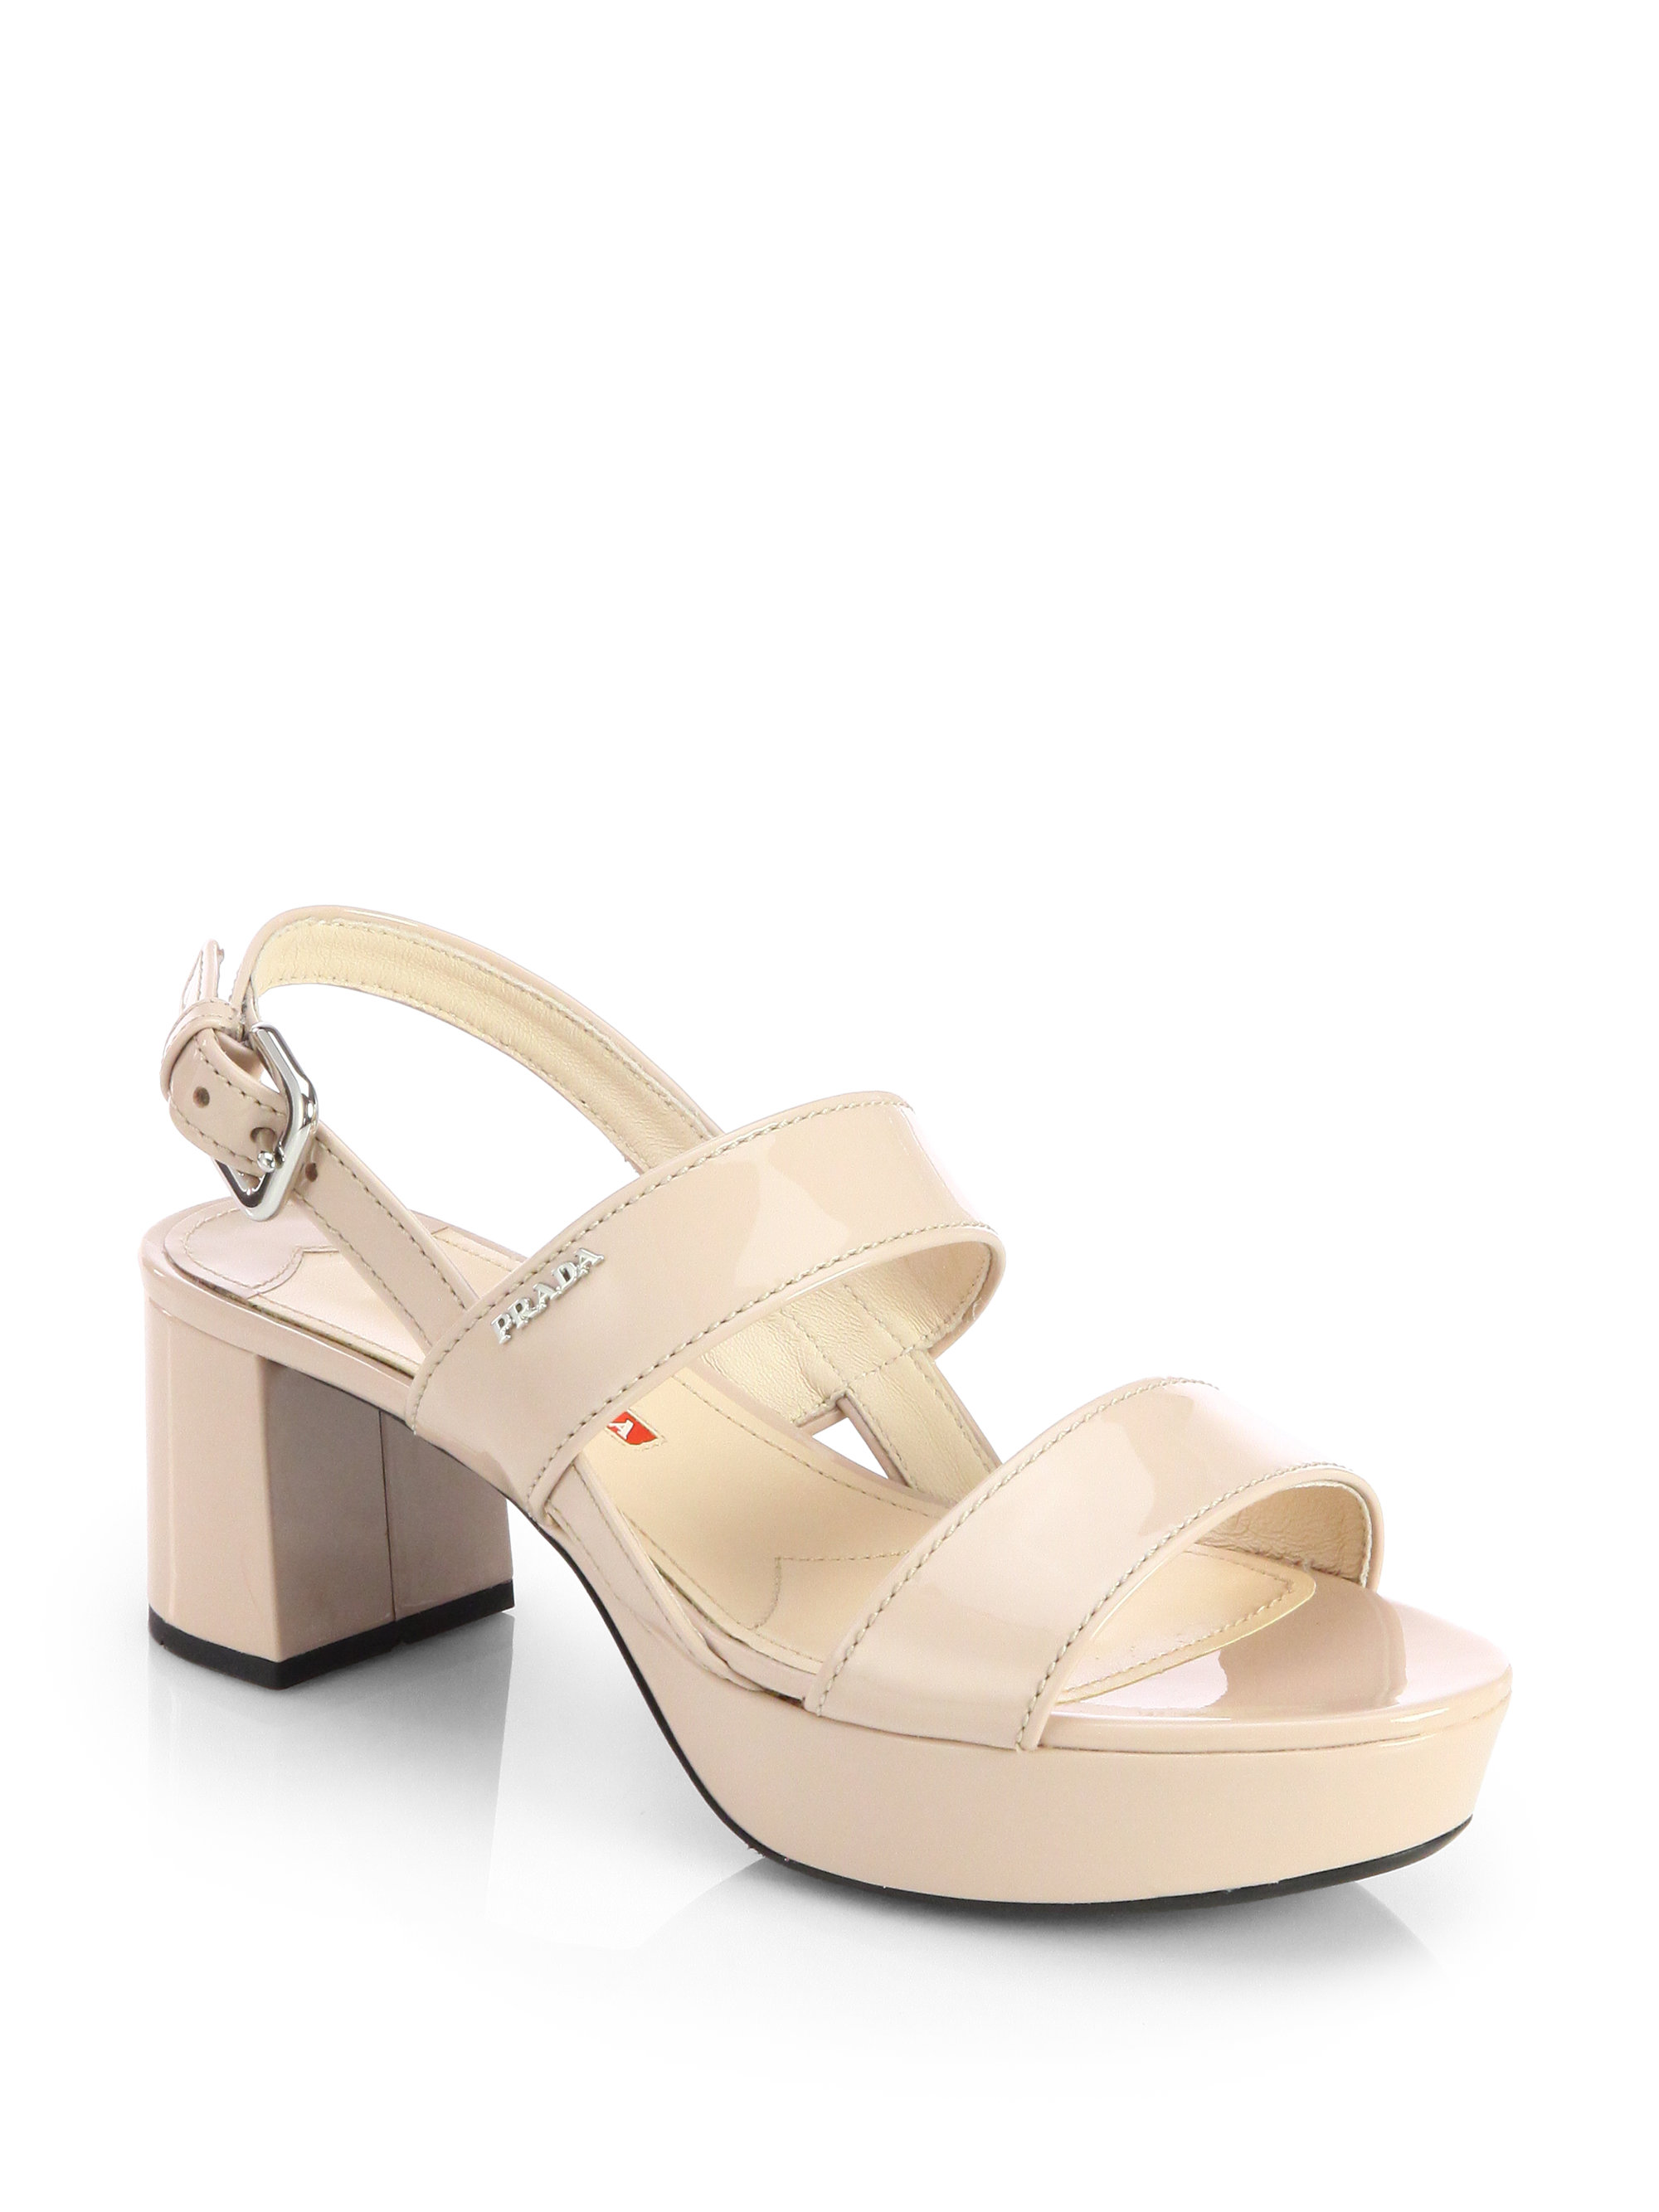 e0a63477a4 Prada Patent Leather Block-Heel Sandals in Natural - Lyst